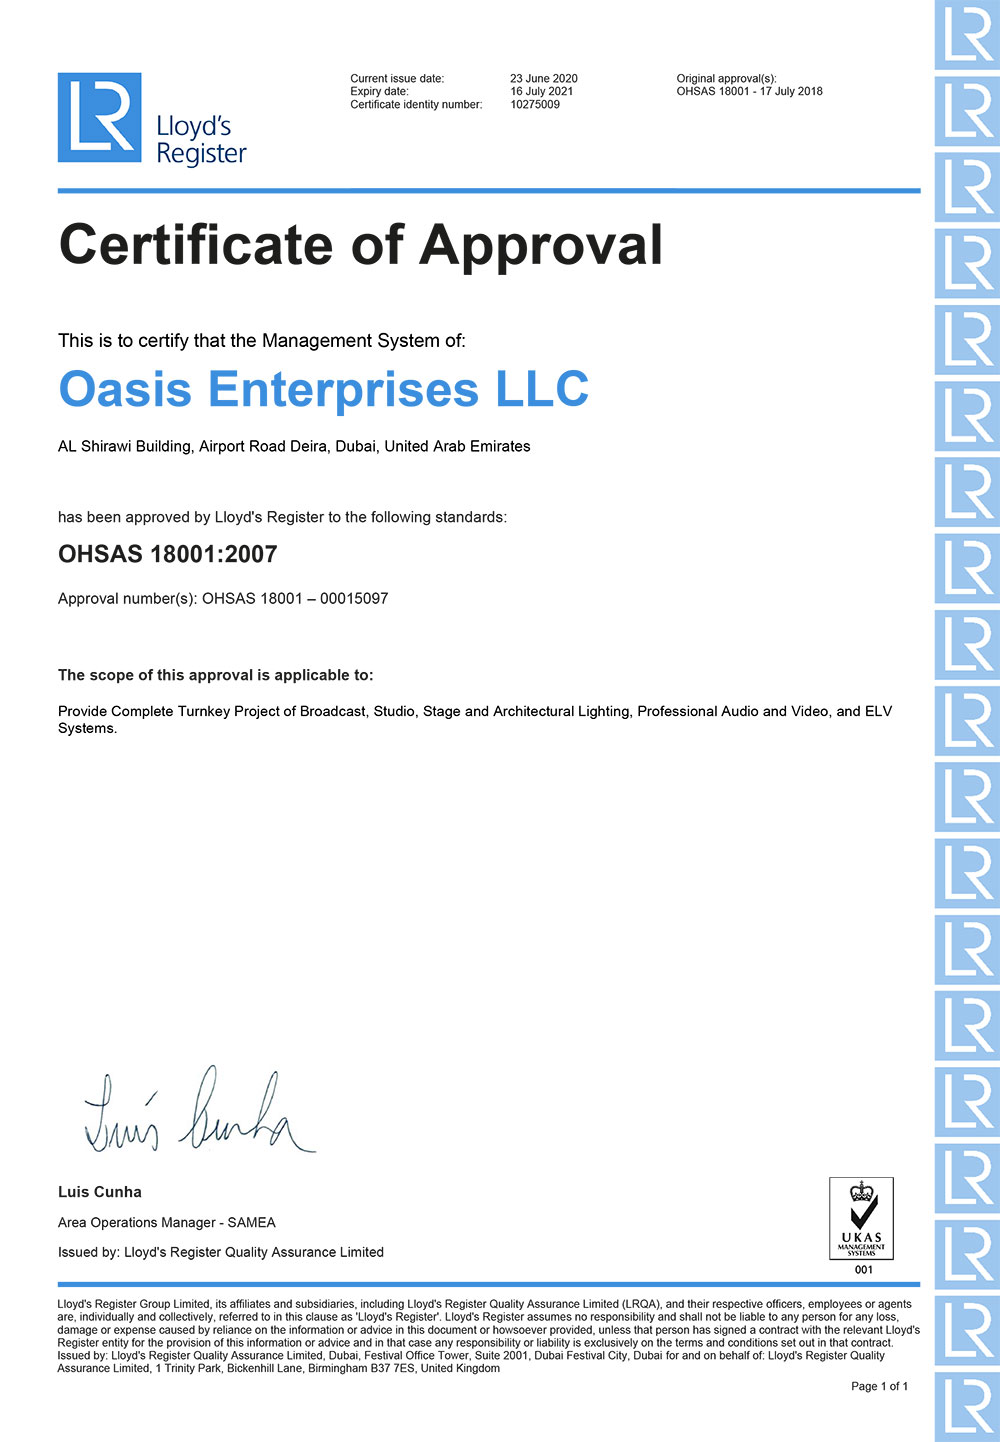 OHSAS 18001:2007 Certified | Oasis Enterprises LLC